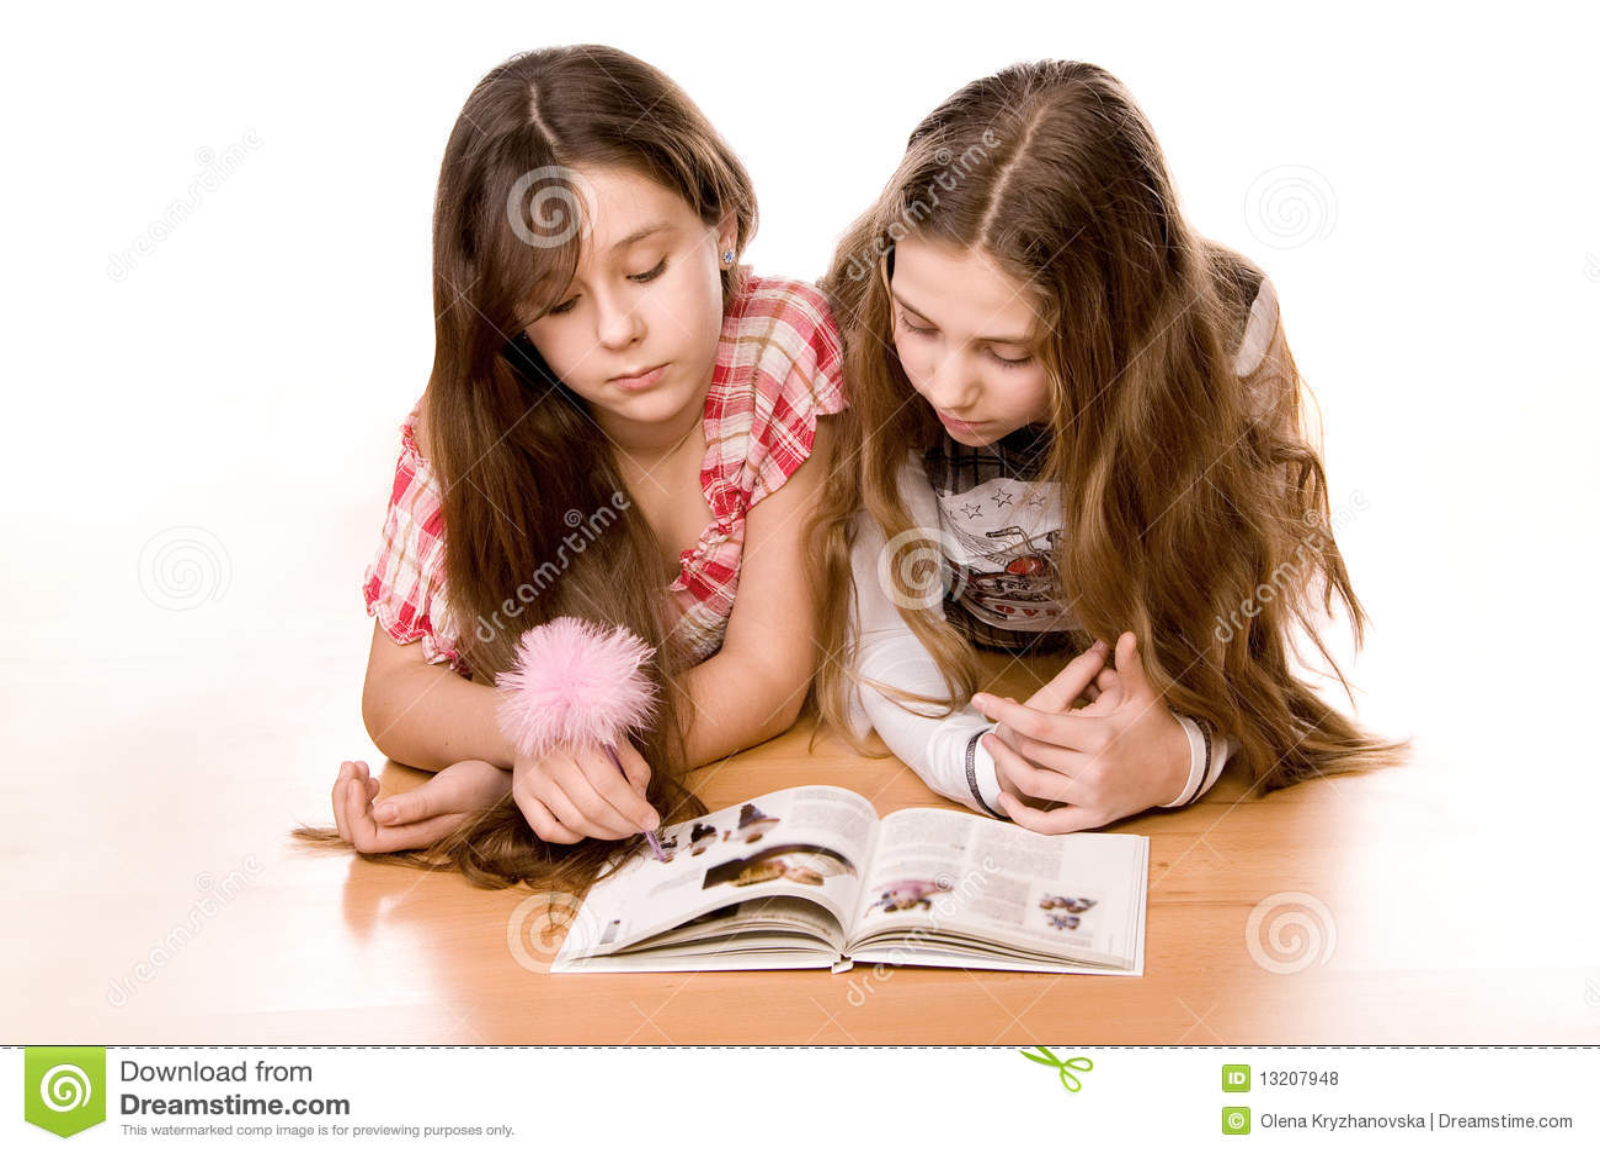 2 girls reading a dirty magazine 7